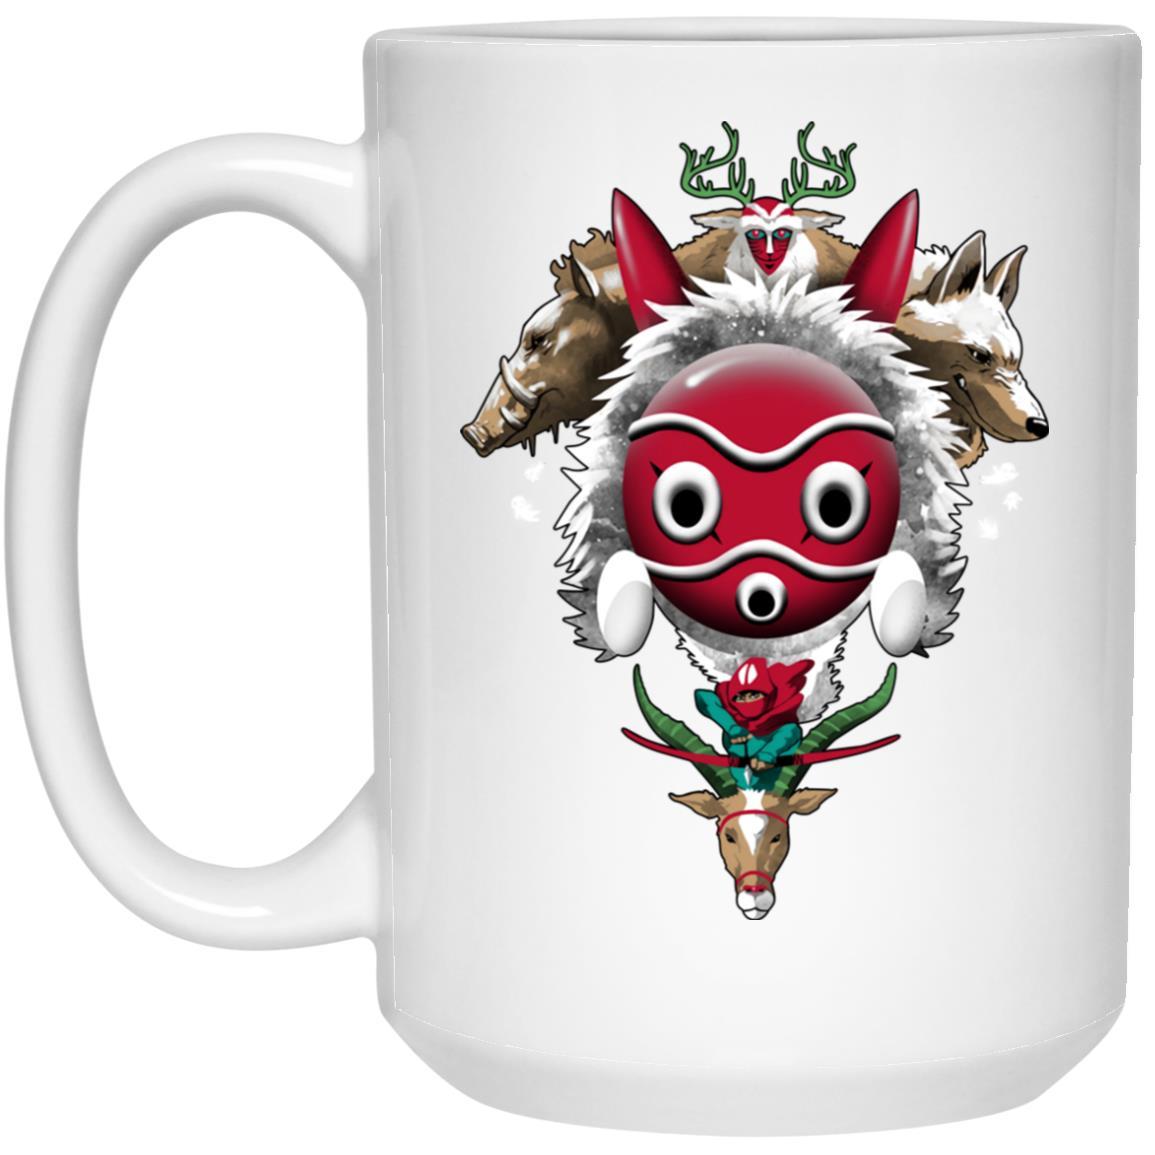 Princess Mononoke – The Forest Protectors Mug